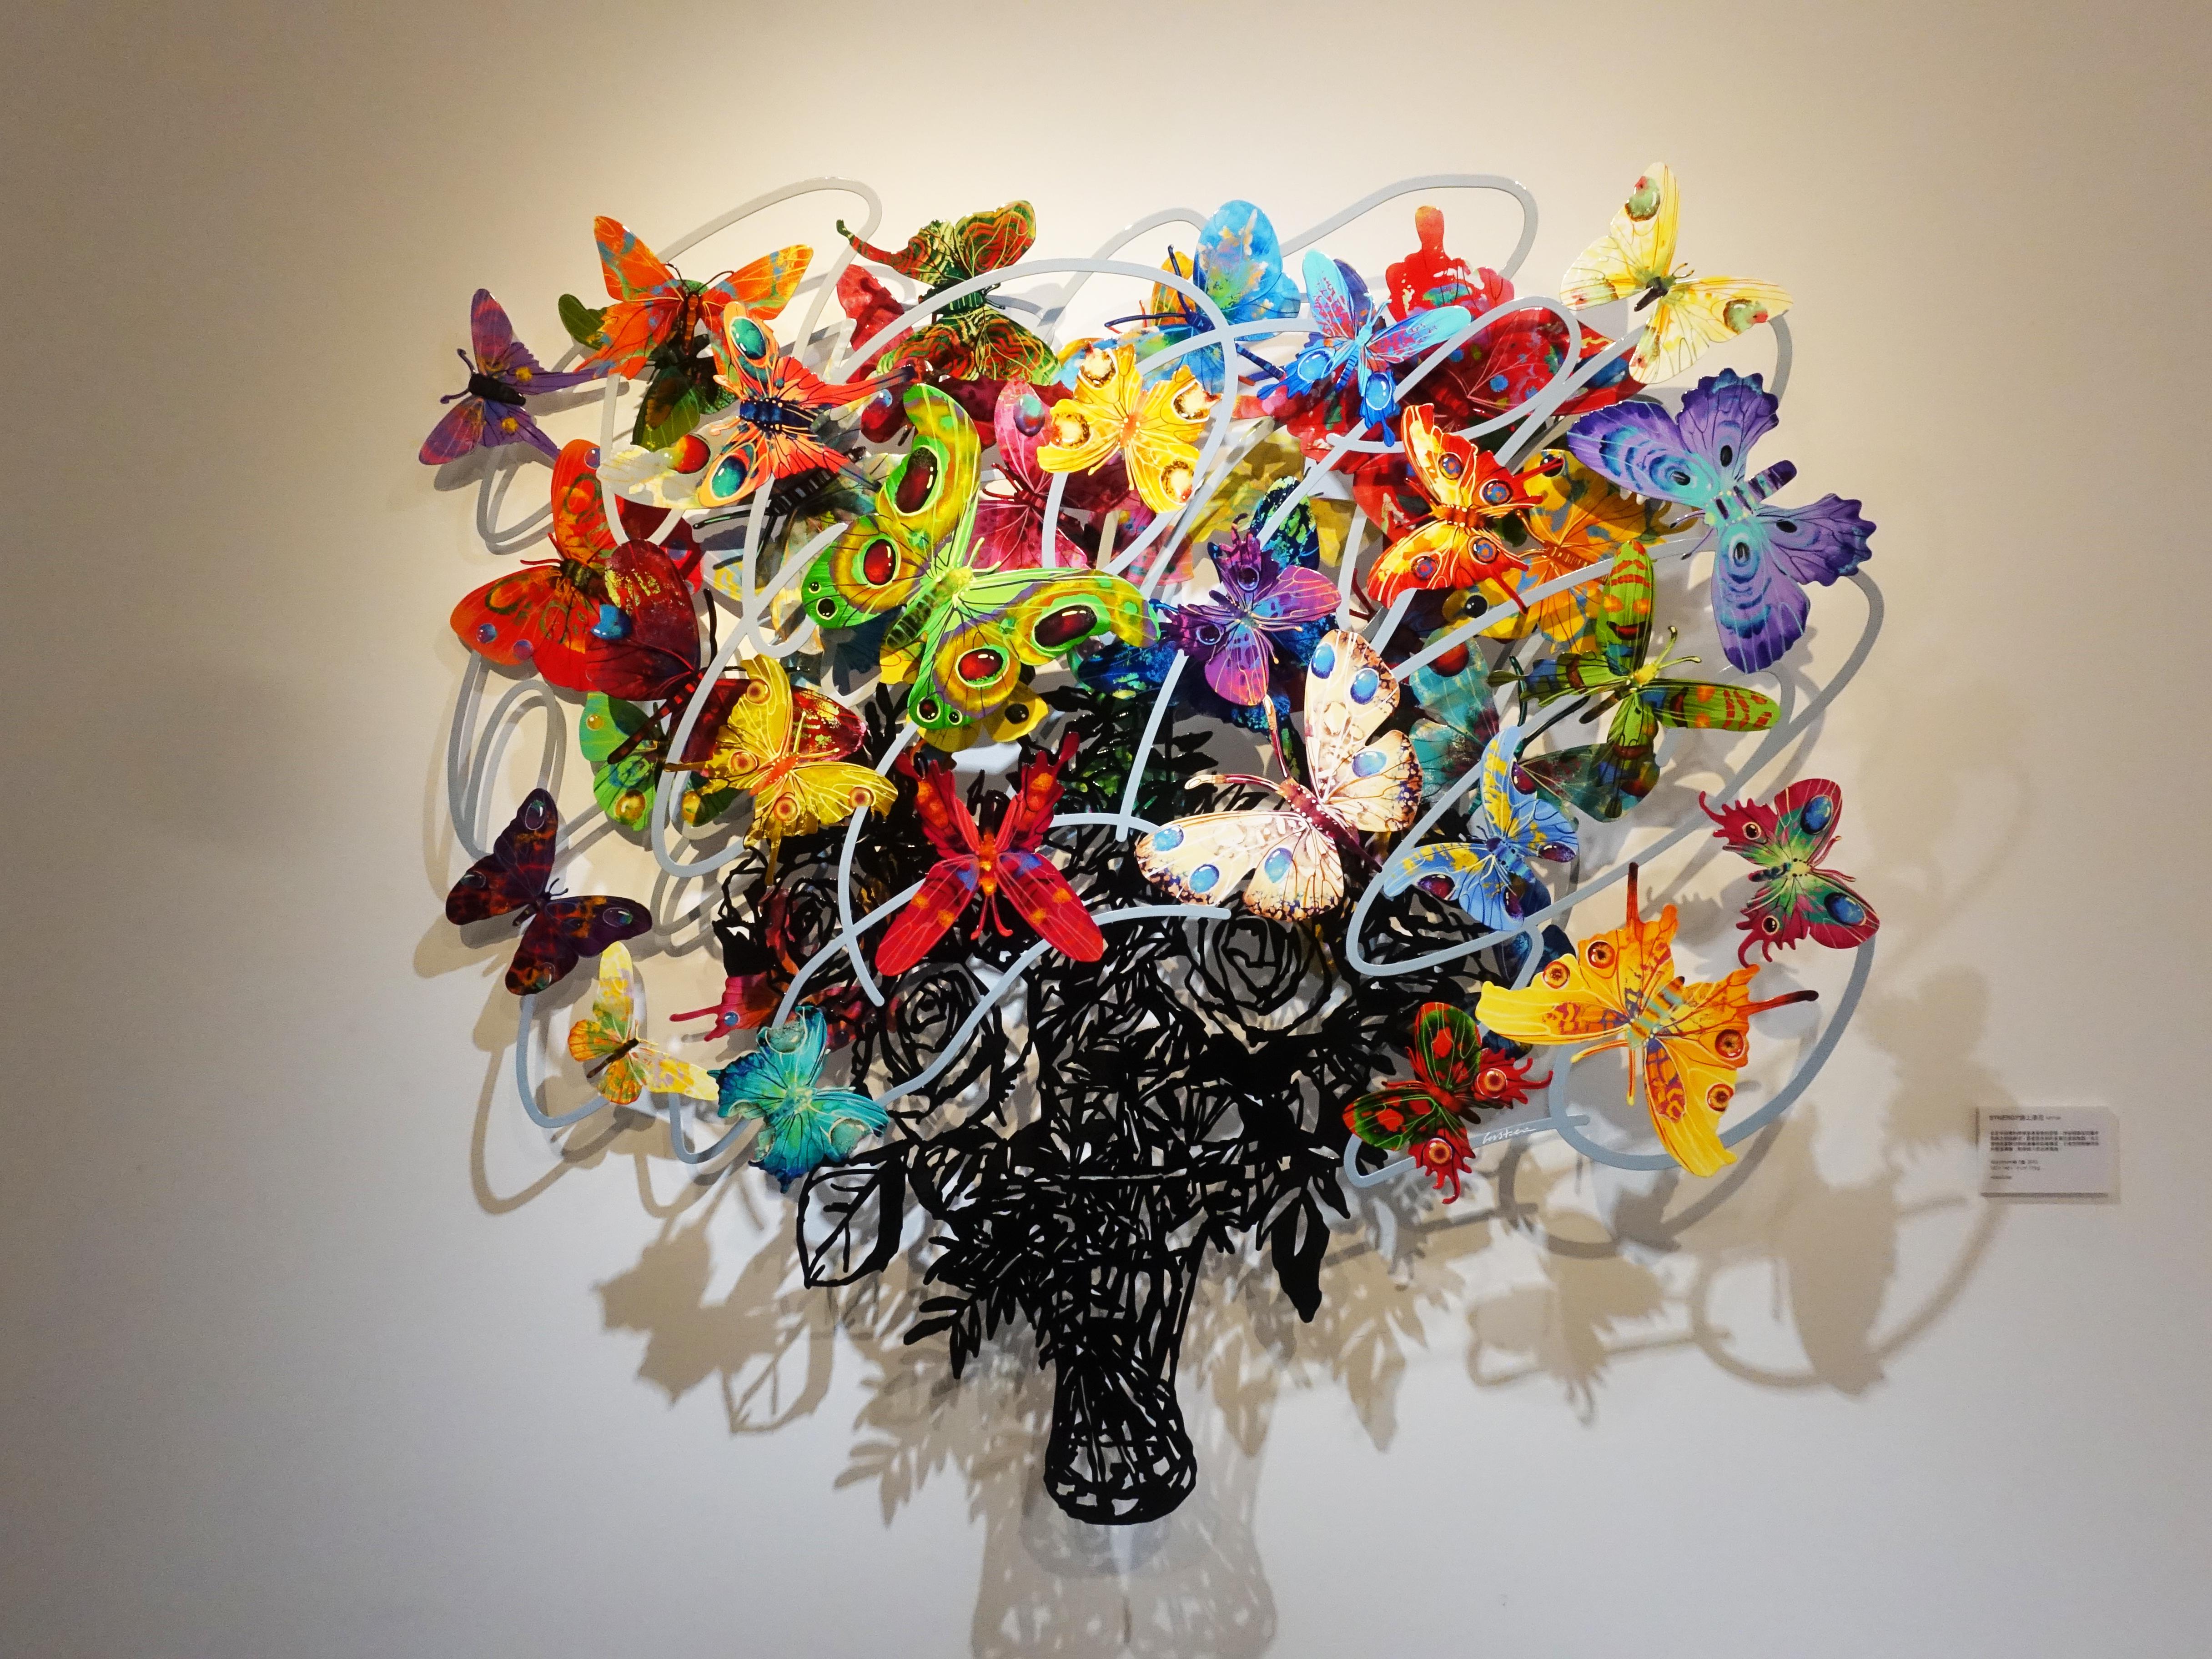 David Gerstein,《Synergy》,160 x 146 x 14 cm,Steel鋁3層,2013。